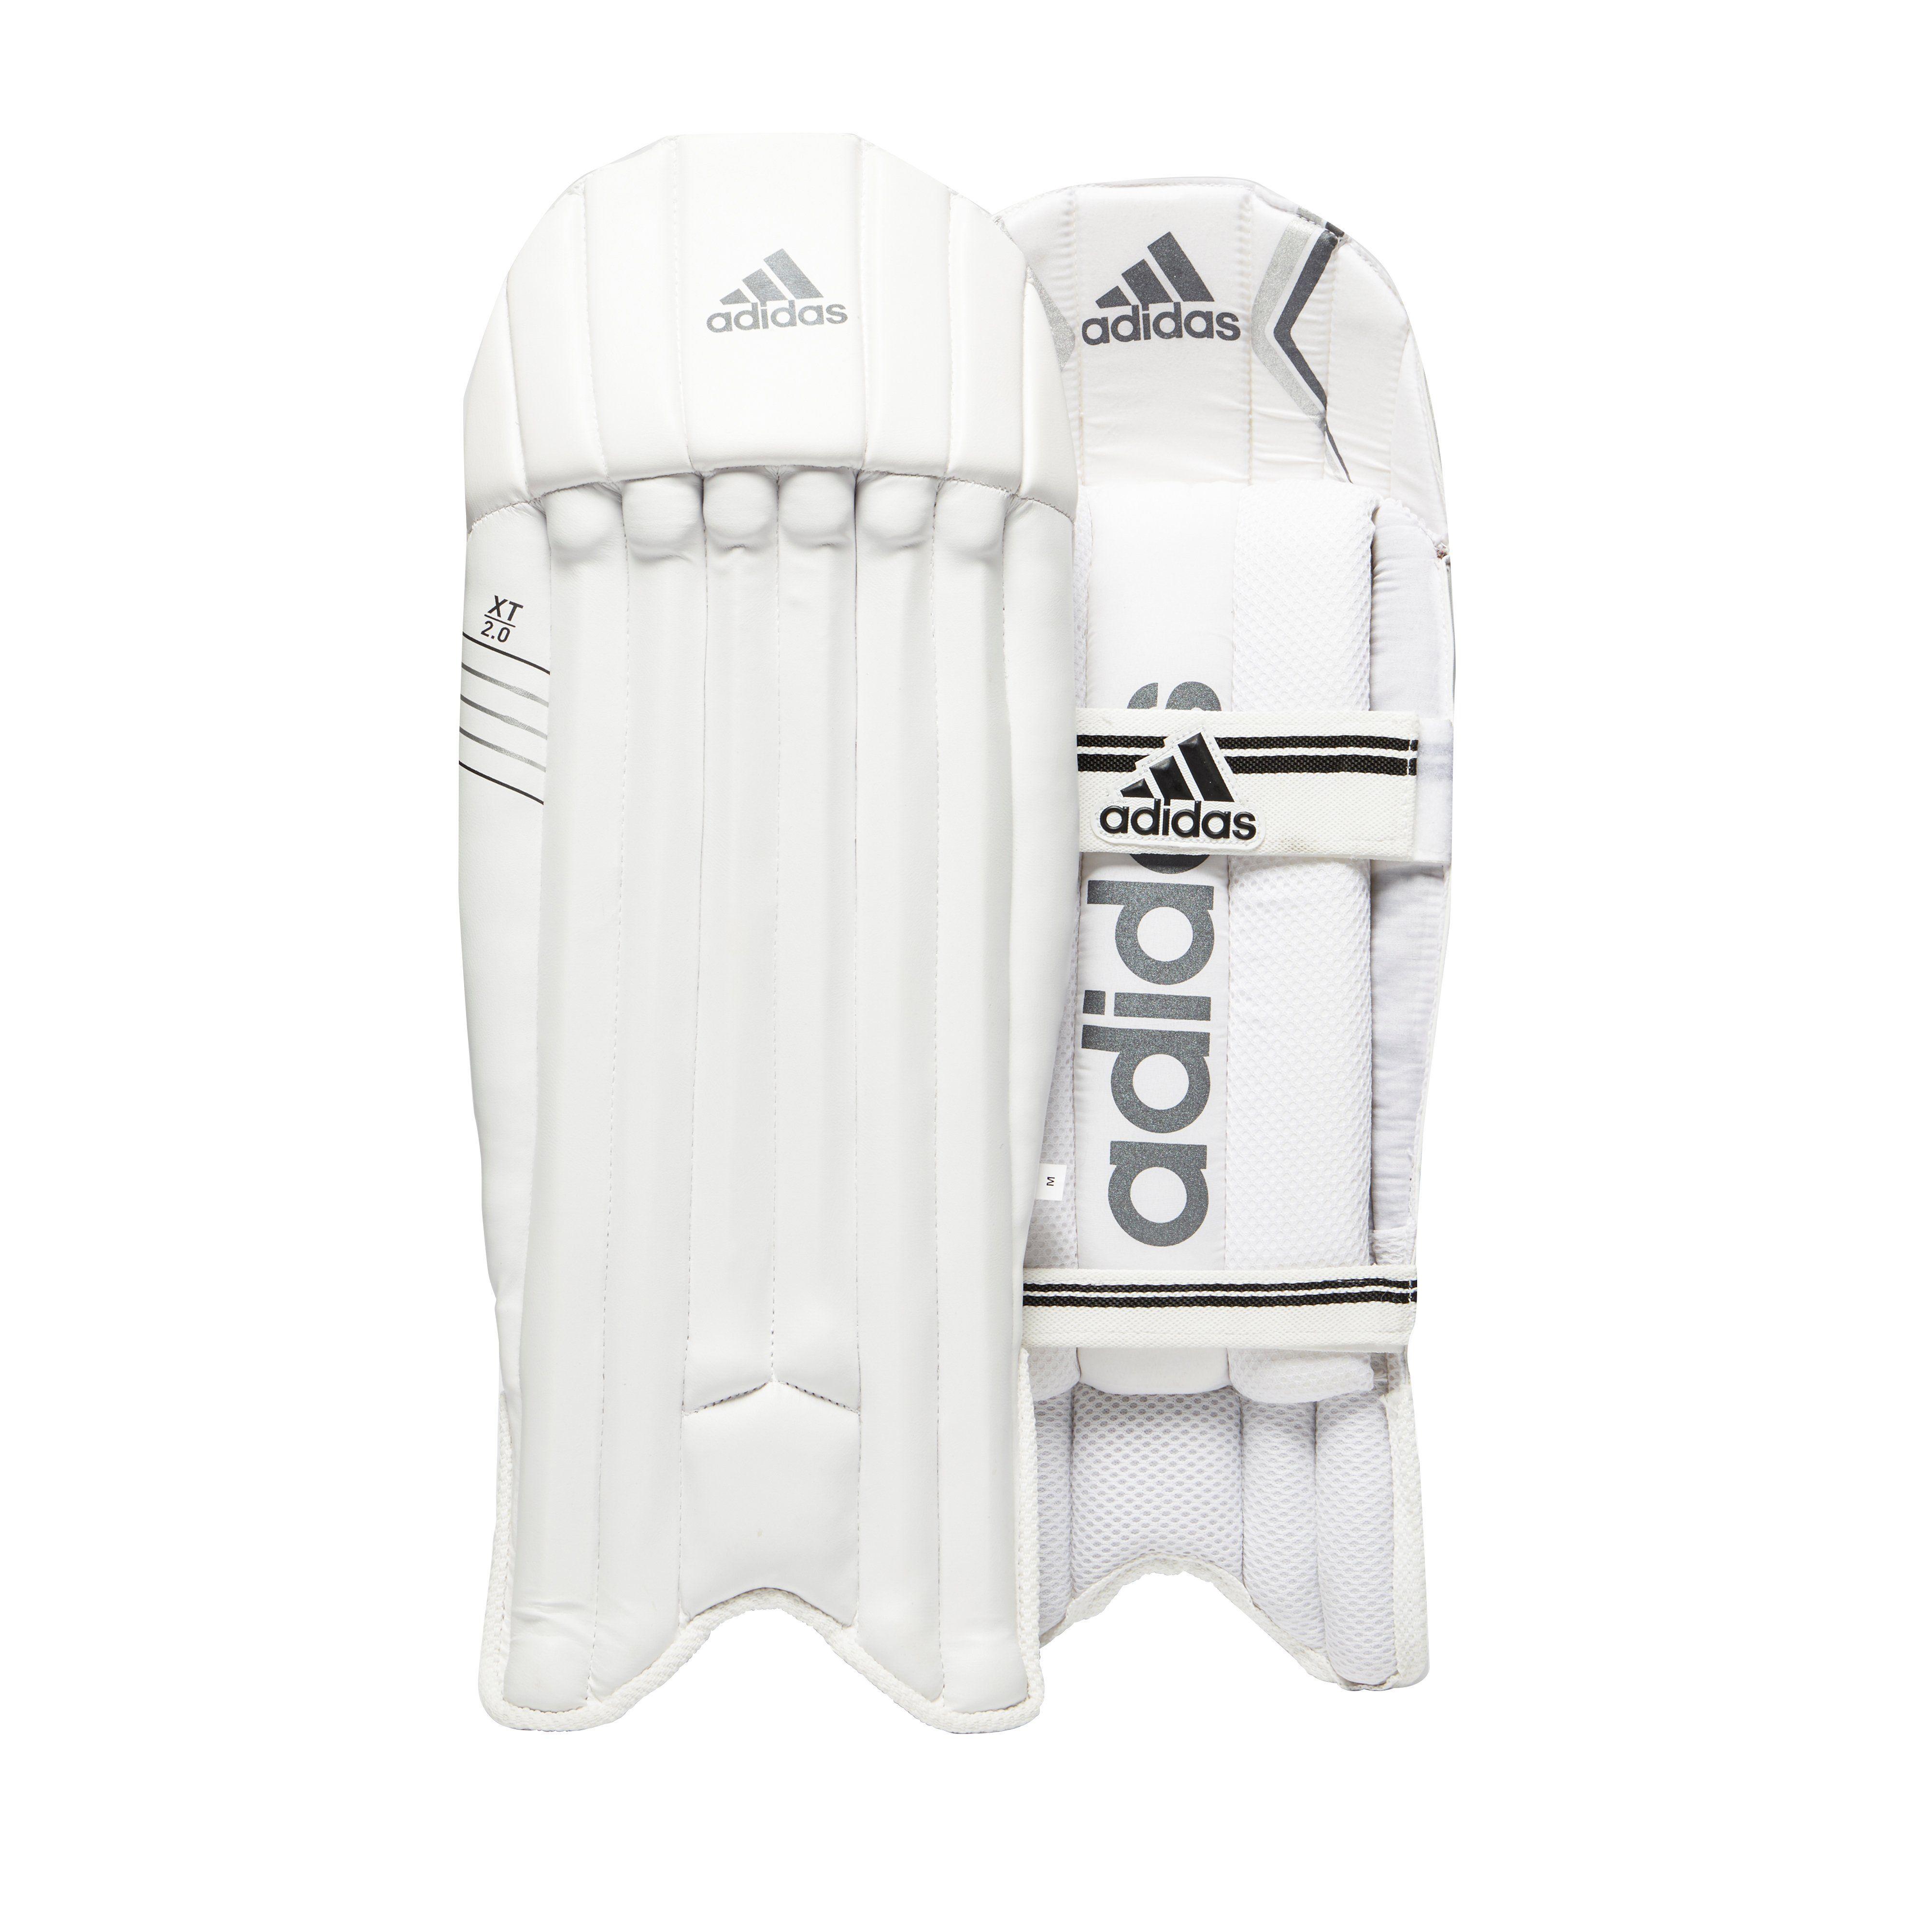 adidas XT 2.0 Wicket Keeping Pads